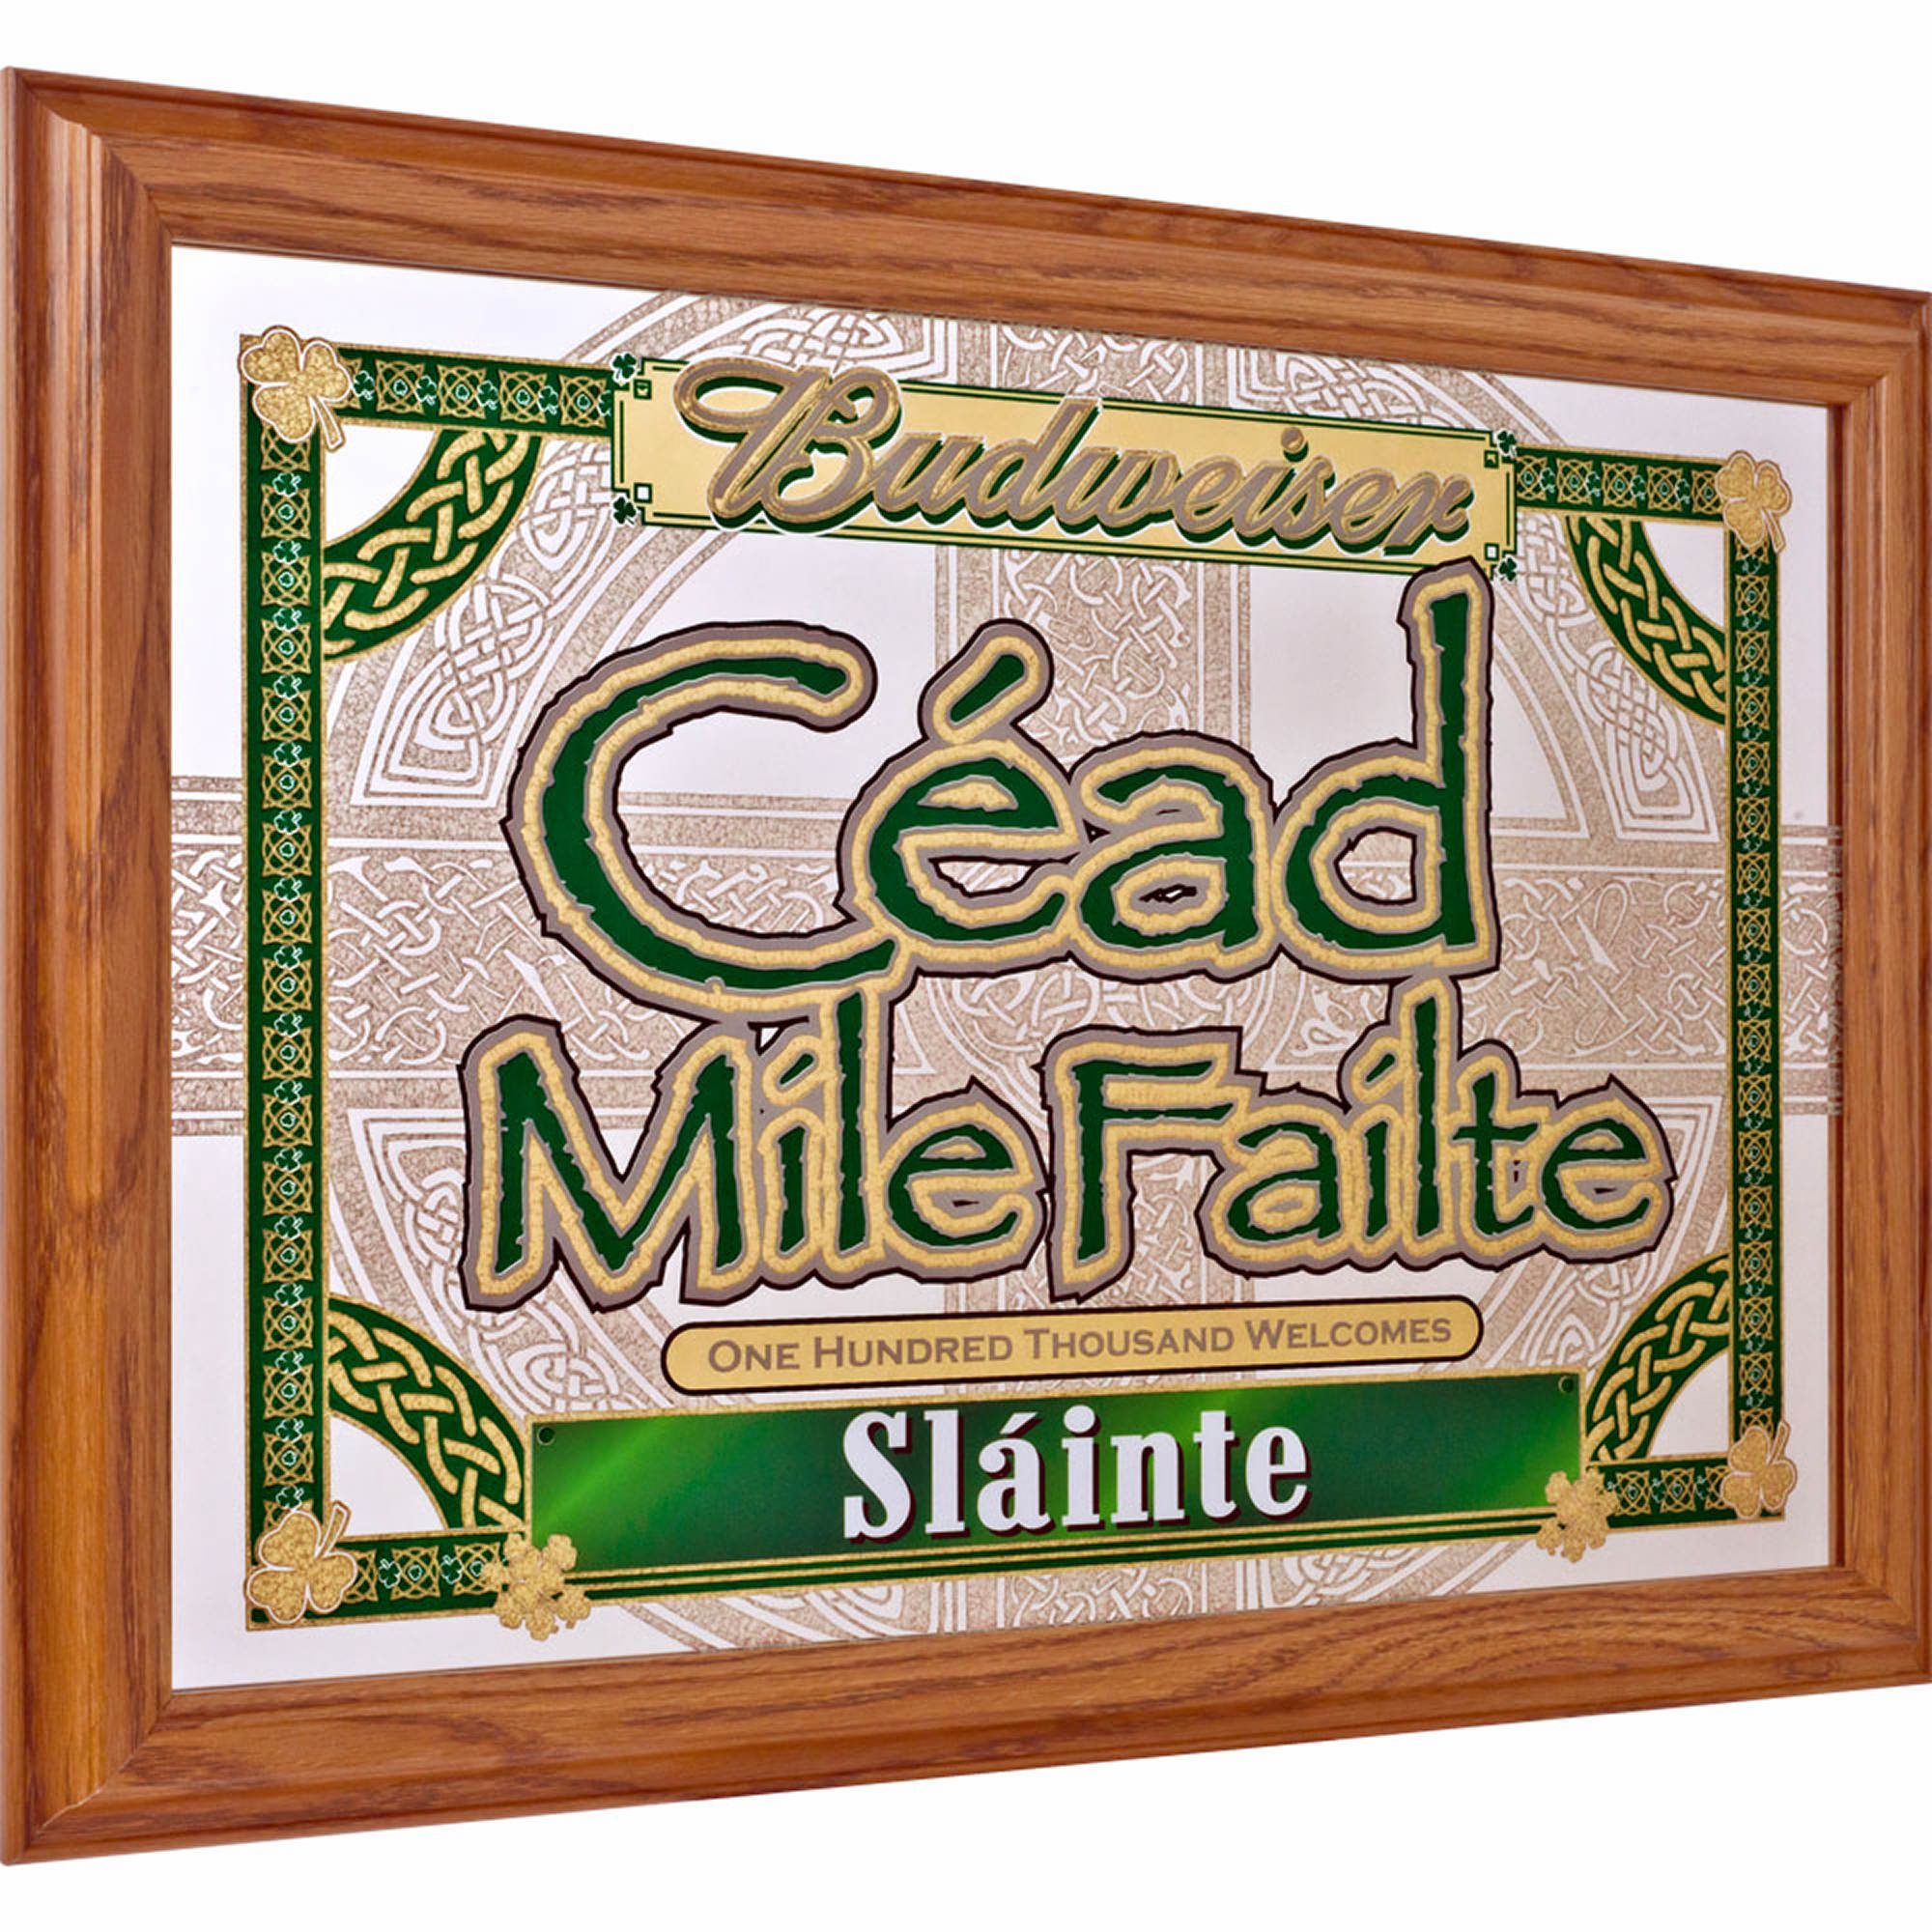 Cead Mile Failte Budweiser Slainte Mirror